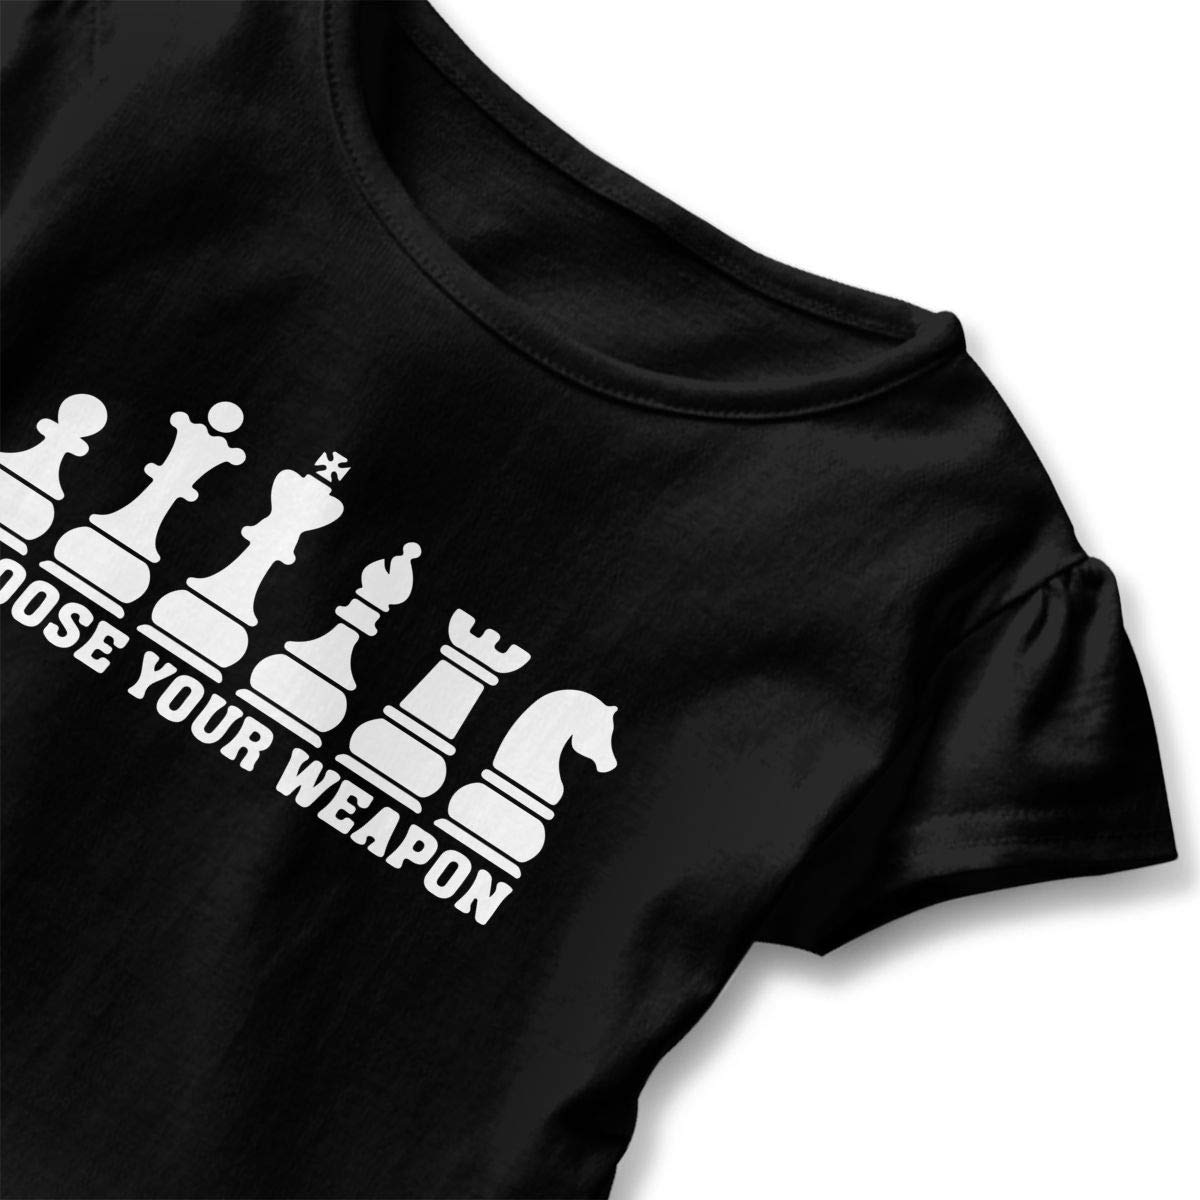 SHIRT1-KIDS Chess Club Choose Your Weapon Childrens Girls Short Sleeve Shirts Ruffles Shirt T-Shirt for 2-6T